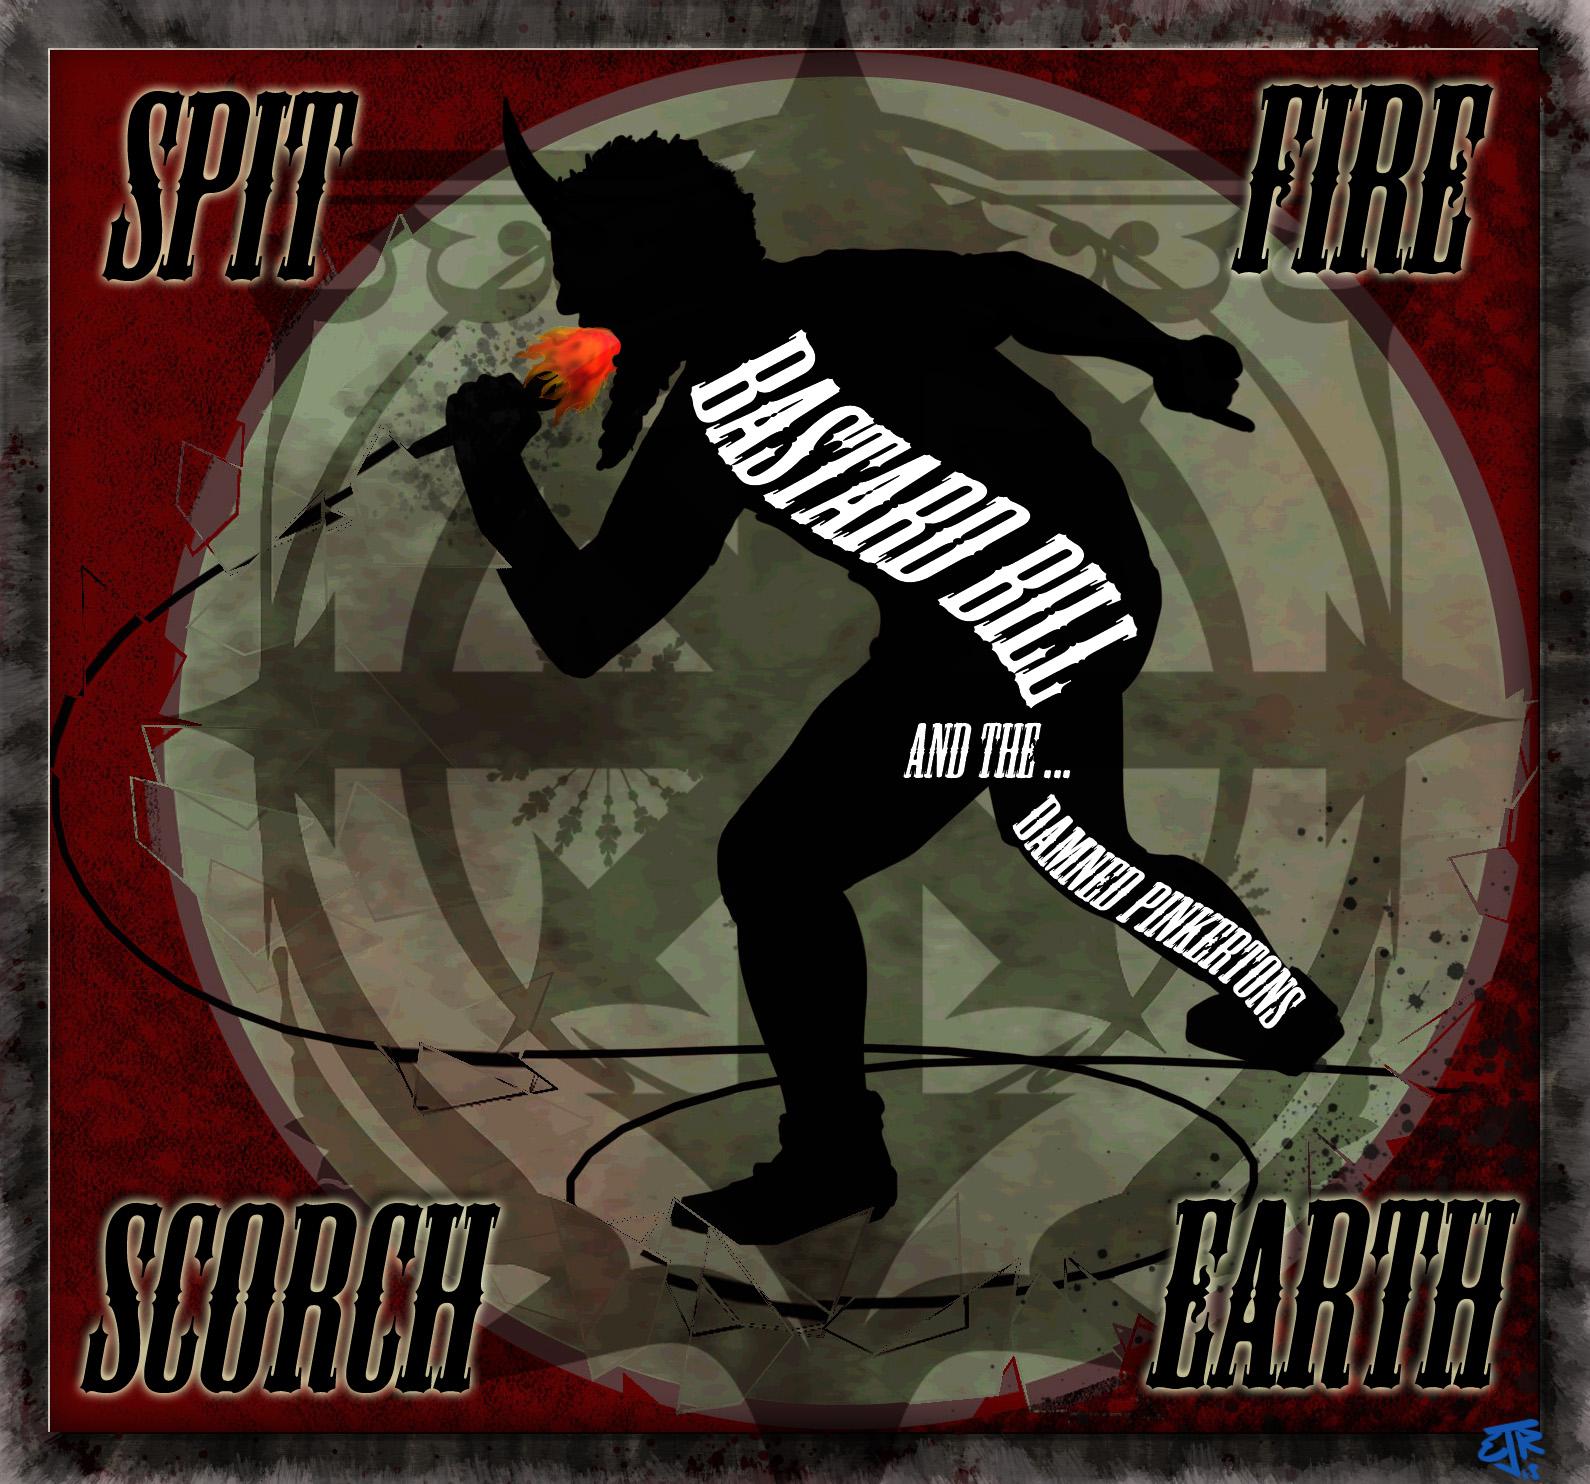 Bastard Bill Clutch CD Cover by Erik Roggeveen